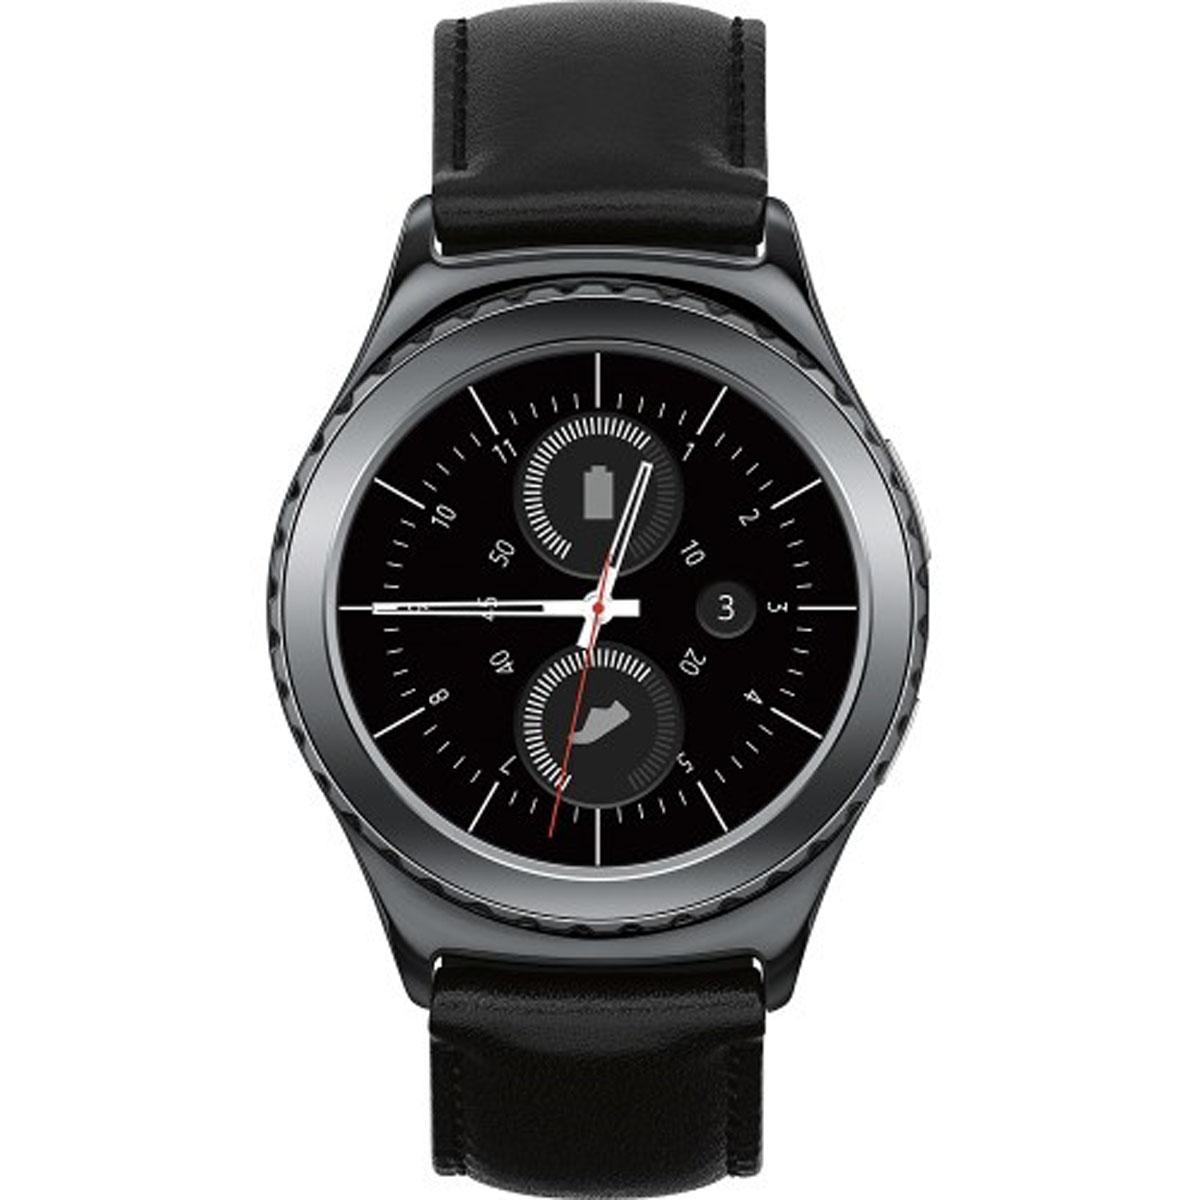 Samsung Gear S2 Classic SM-R735 Black